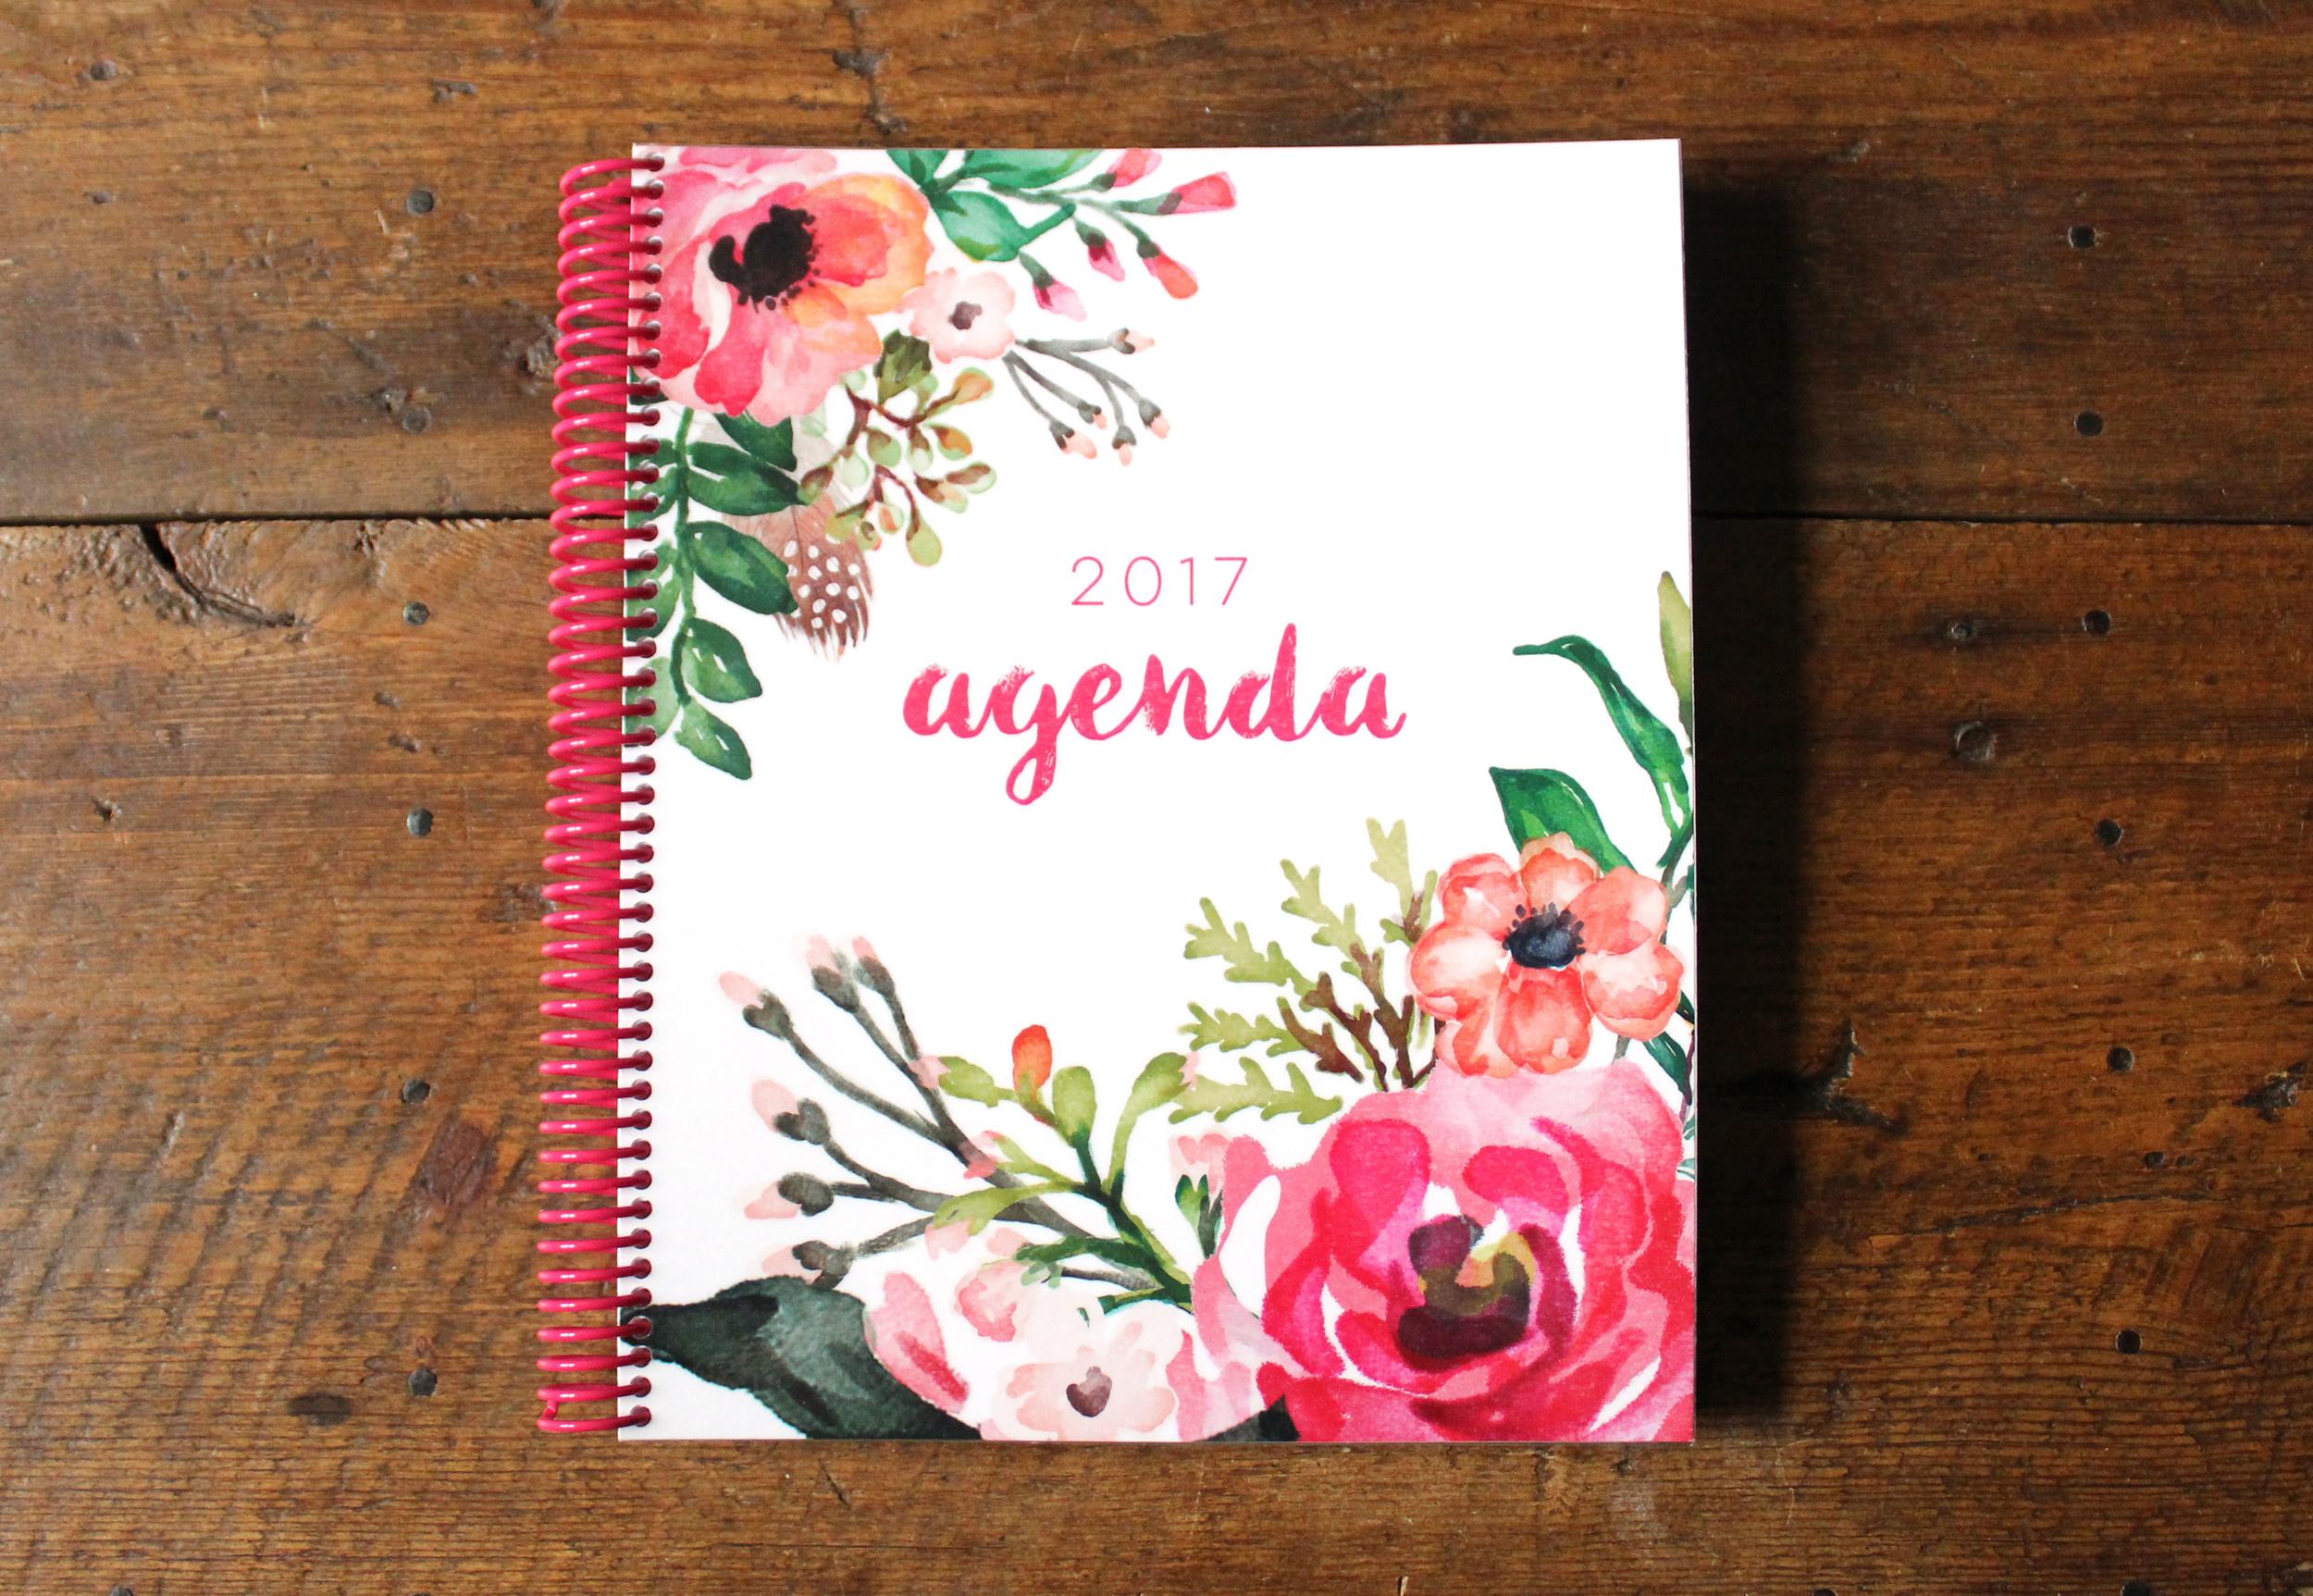 2017 Agenda via Jitney's Journeys // Planner Calendar Annual Monthly Weekly